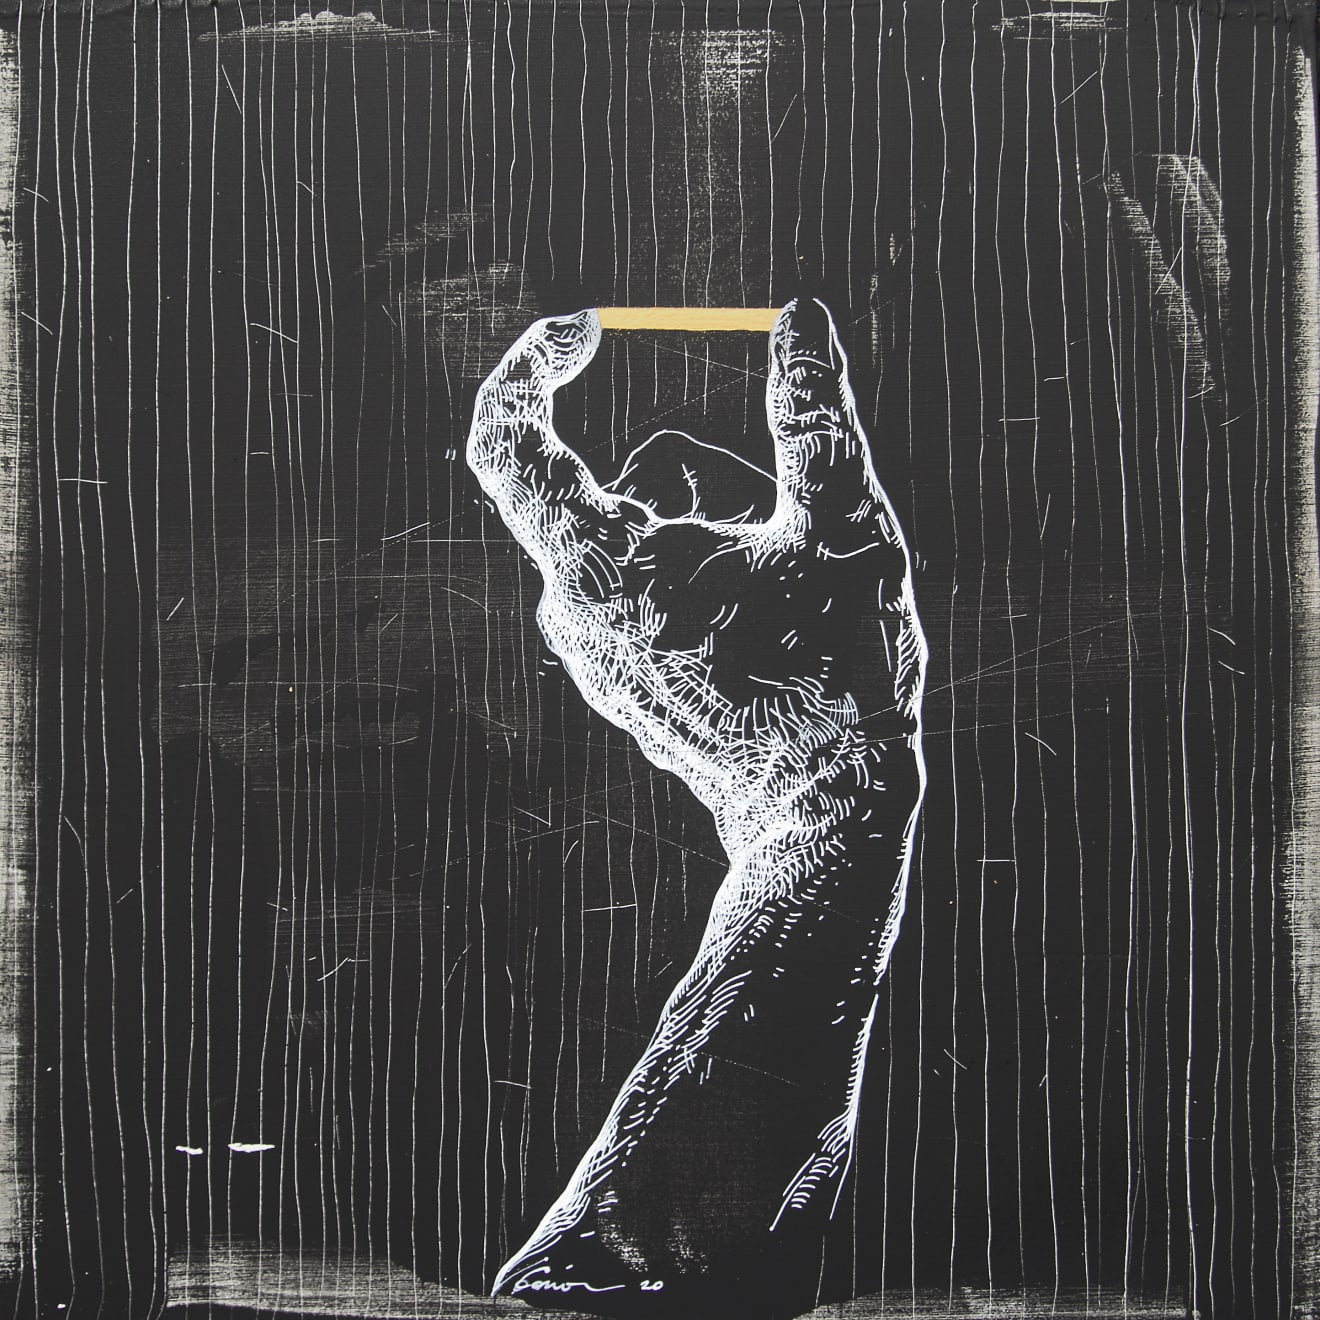 Summer Auction 2020, LOT 72 - Veta Gorner - 'Time on My Hands 2'